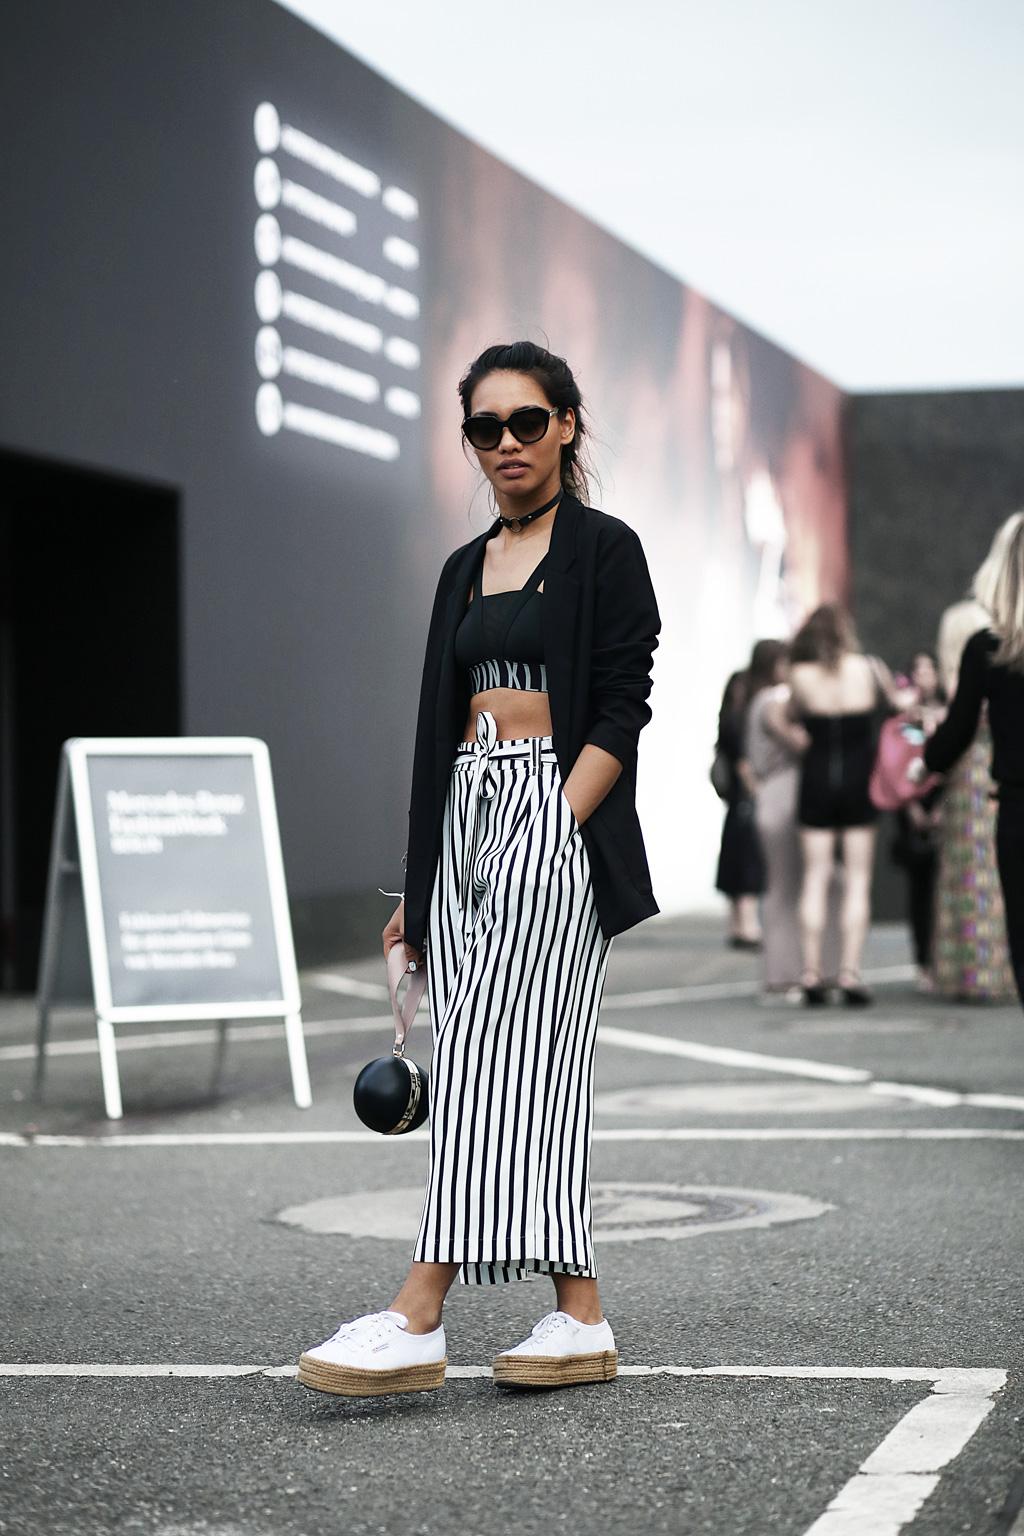 thefashionanarchy_blogger_fashionblogger_modeblog_styleblog_fashionblog_mbfw_berlin_fashionweek_outfit_look_culotte_streifen_sportsbra_superga_muenchen_munich_grannyhair_3